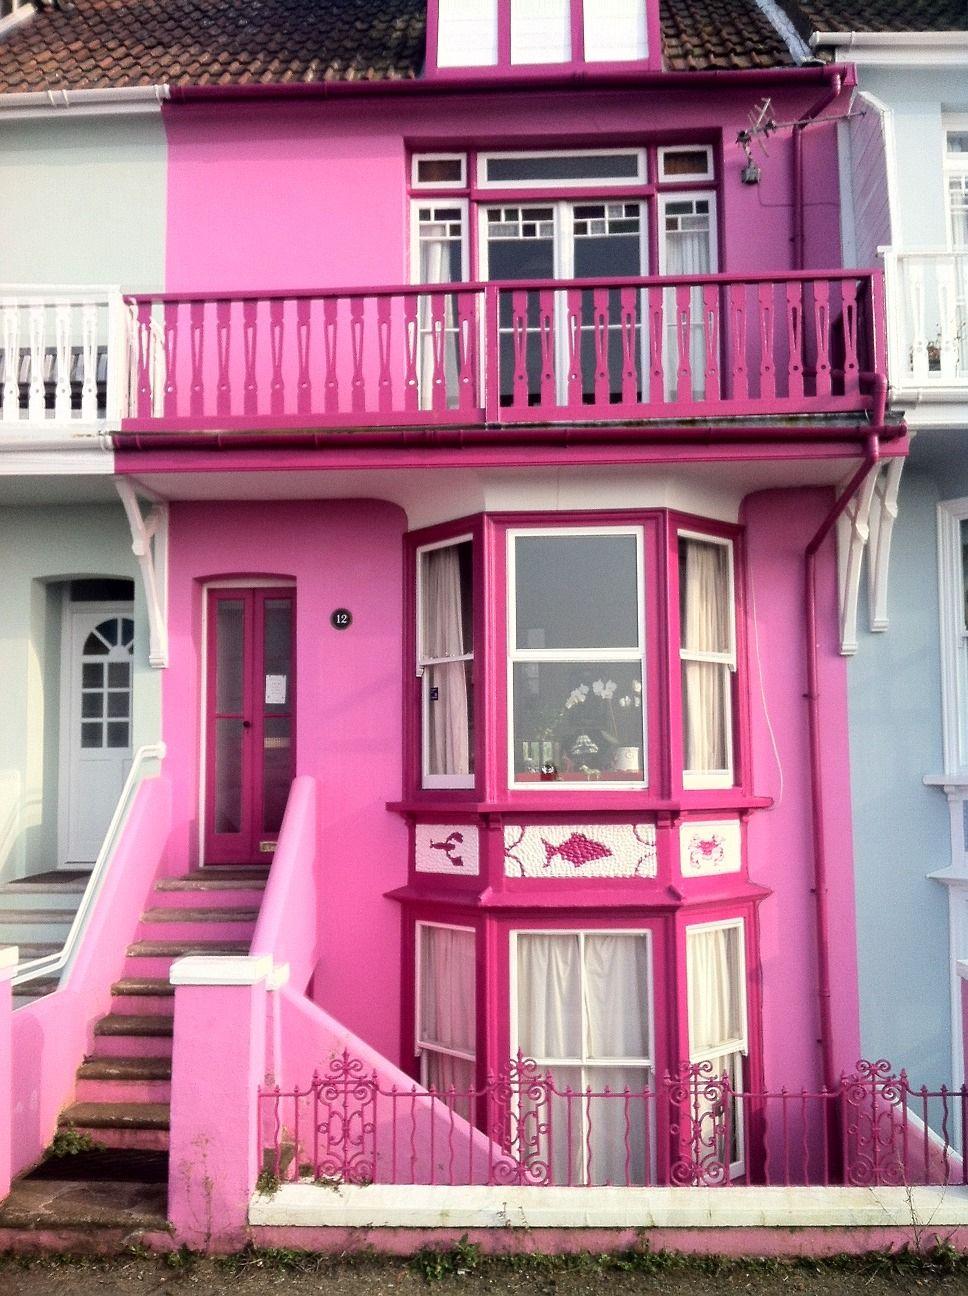 kristy ellis drinkwater | Pretty Pink Passion | Pinterest | Pink ...